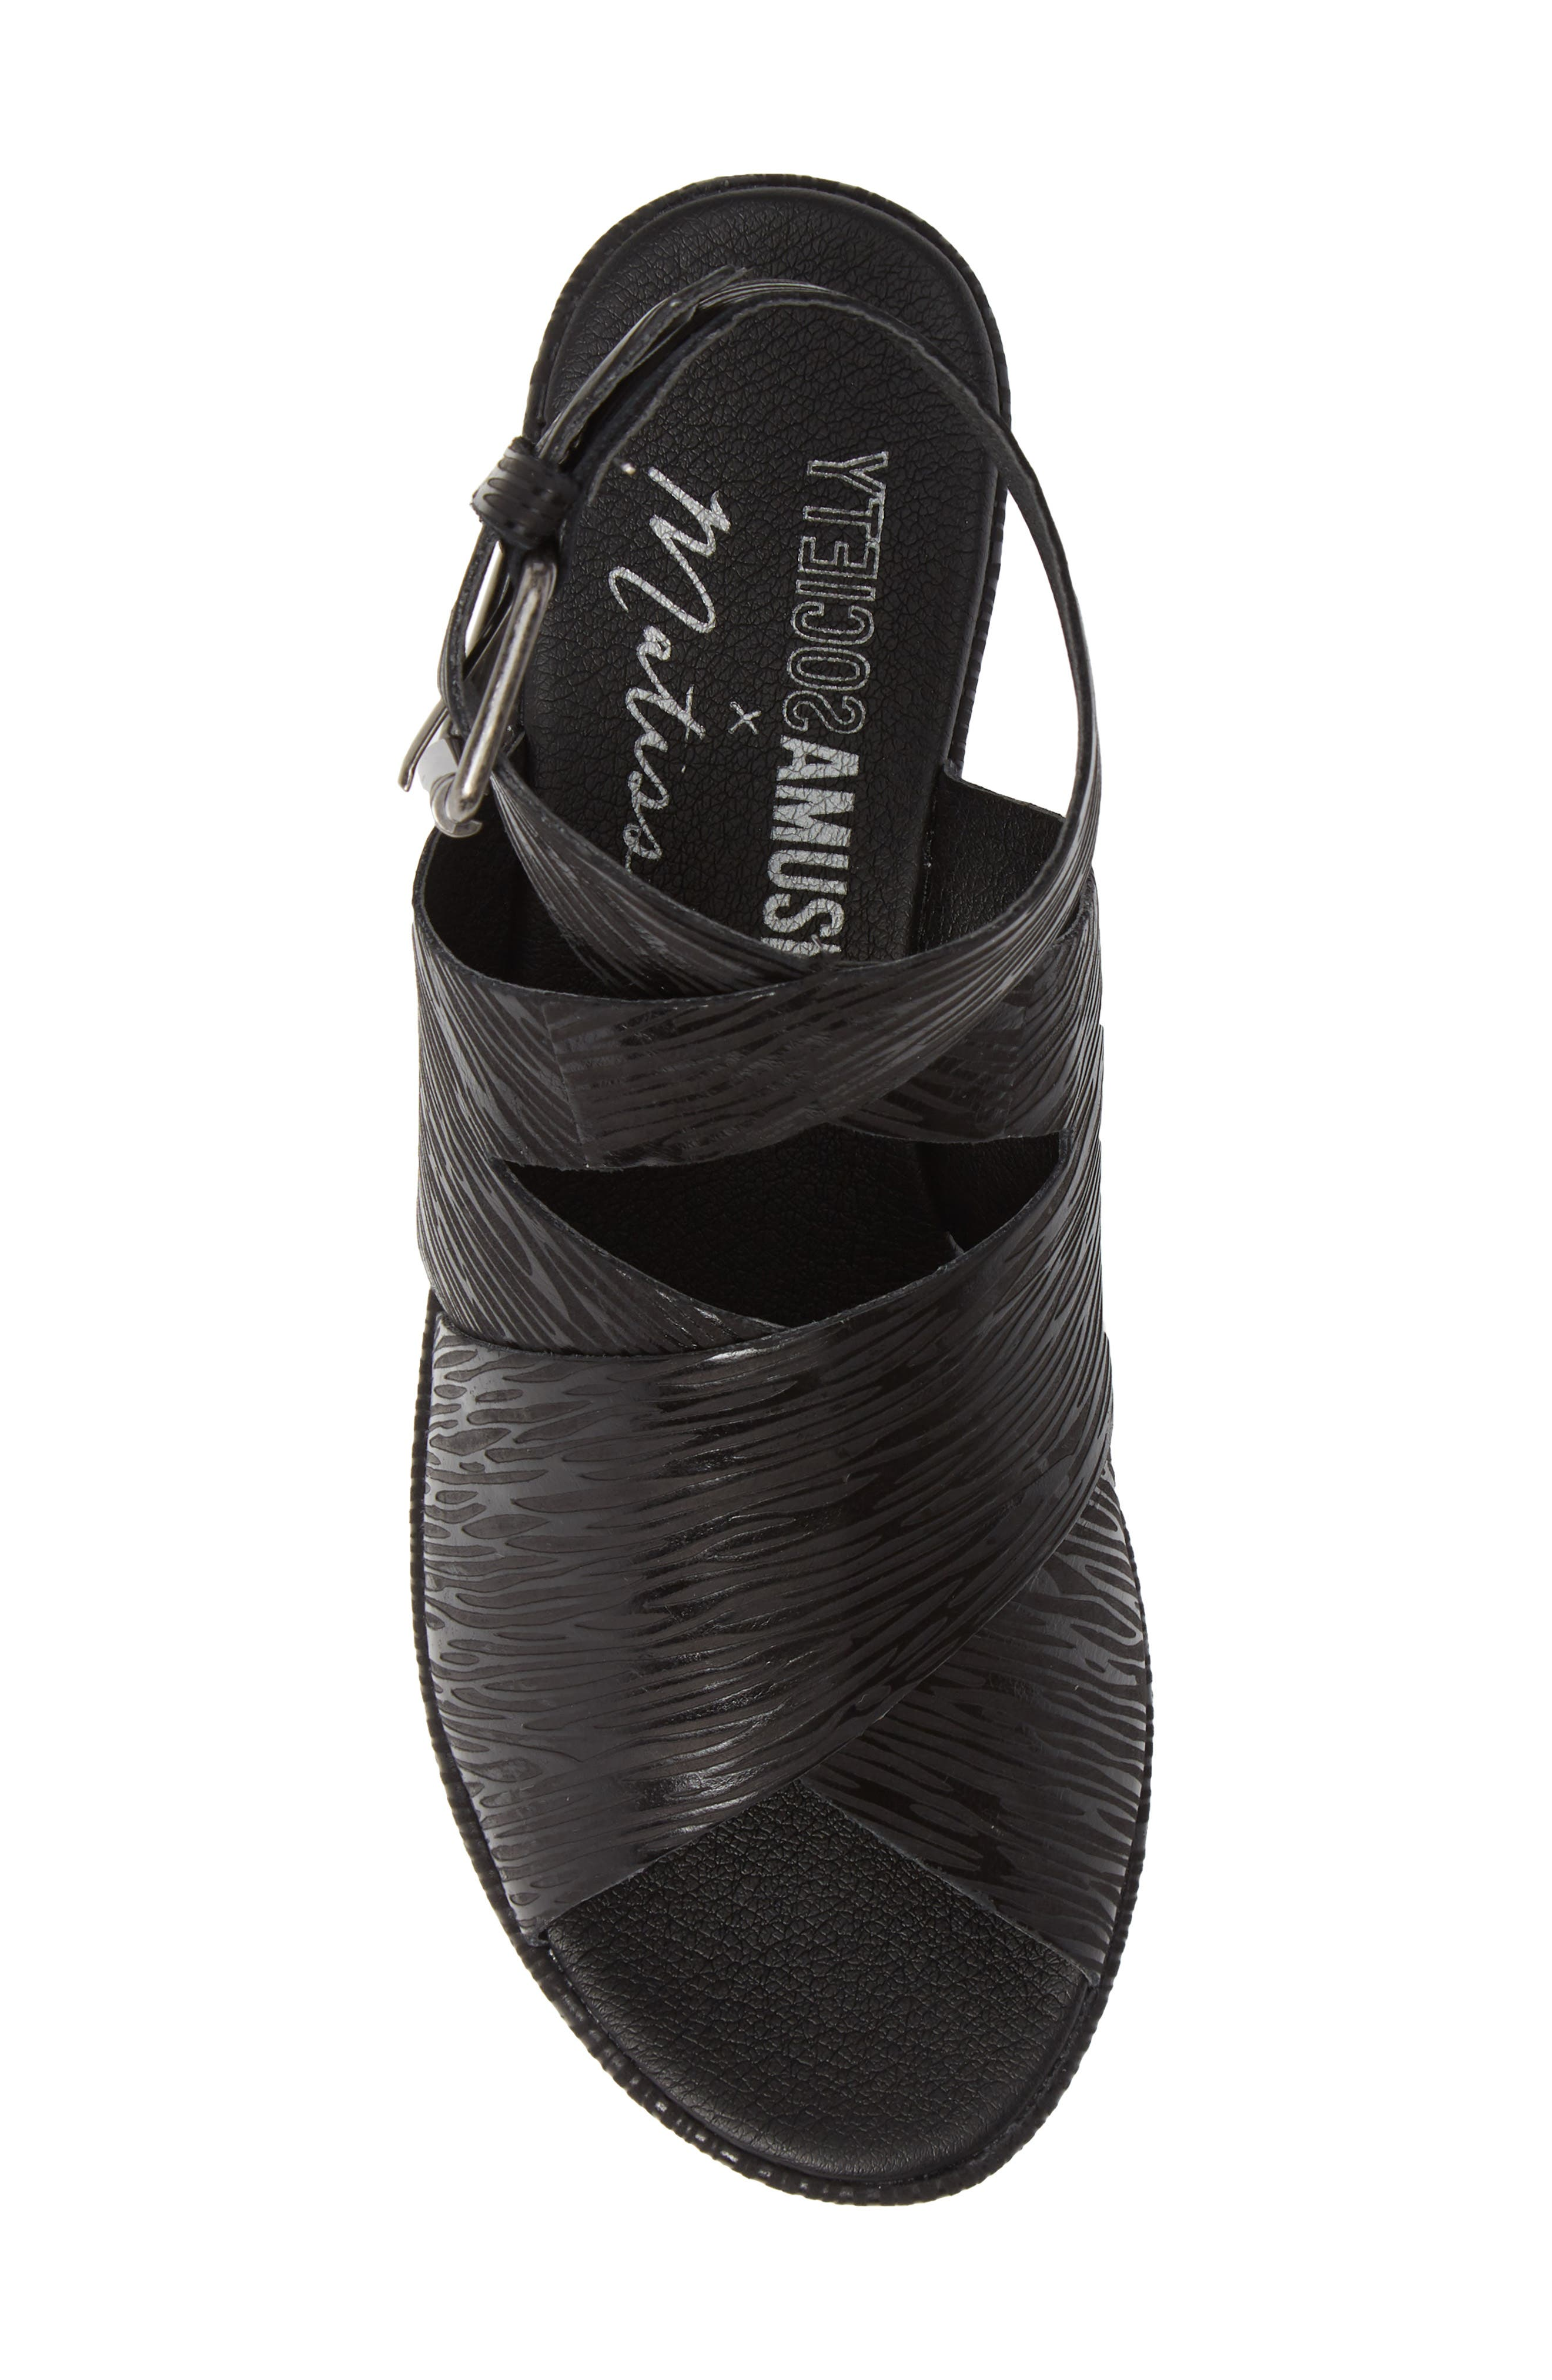 Runaway Wedge Sandal,                             Alternate thumbnail 5, color,                             BLACK LIZARD PRINT LEATHER